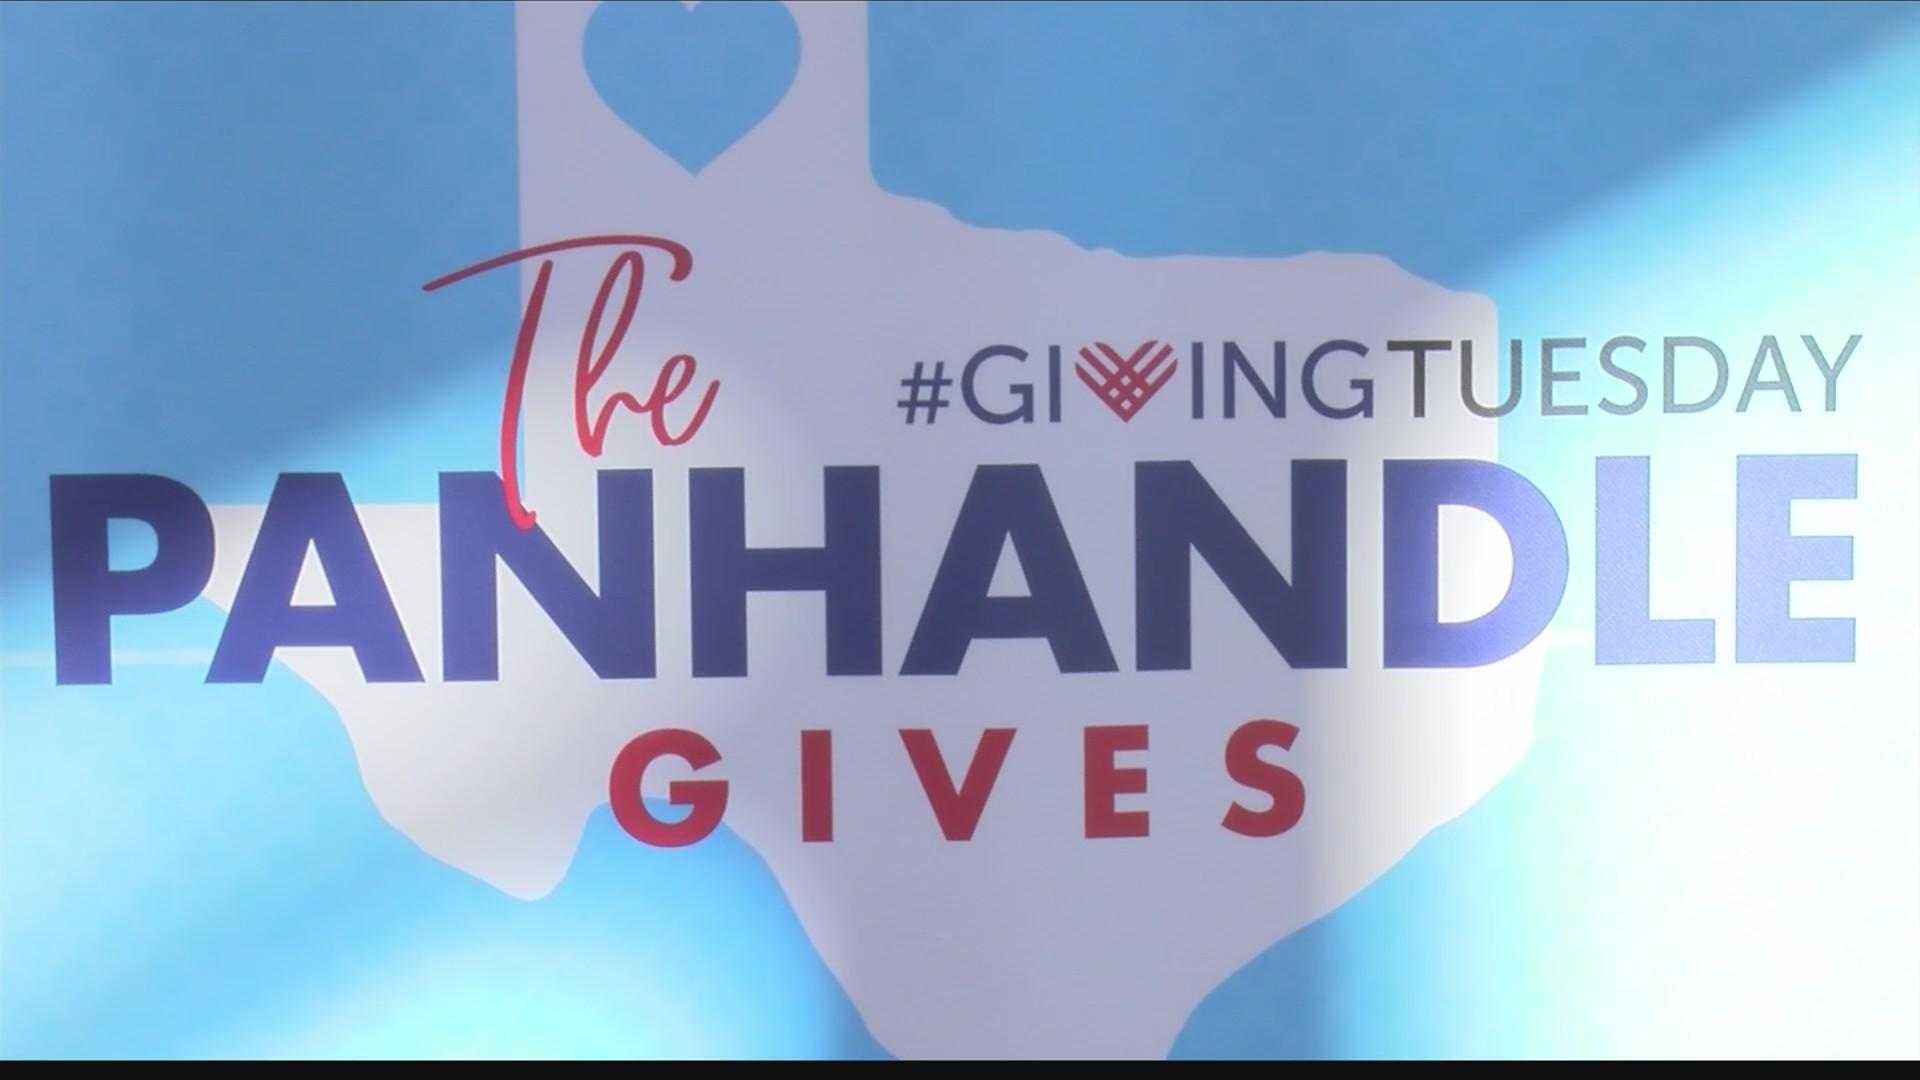 #ThePanhandleGives Kicks Off 9 Days of Giving